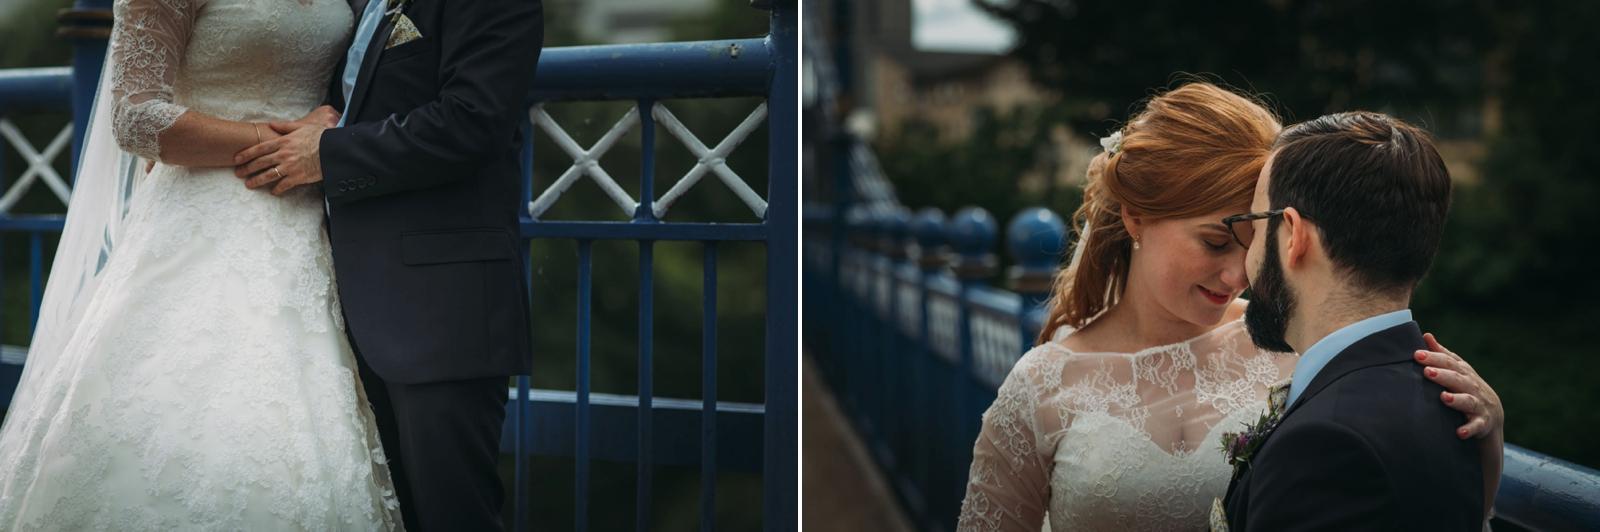 Gillian-Evan-West-Brewery-Jo-Donaldson-Photography-404.jpg